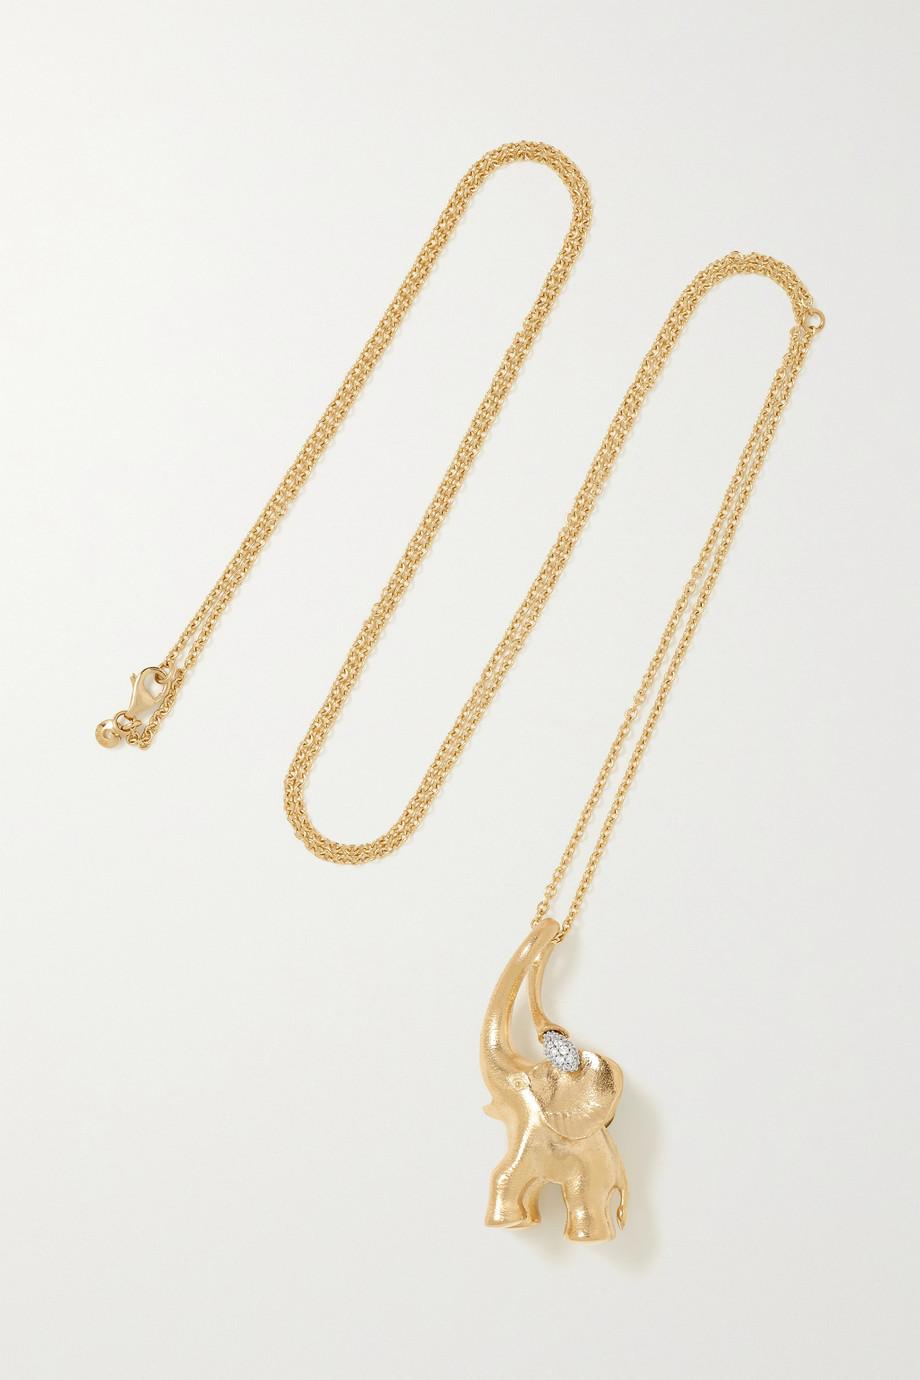 OLE LYNGGAARD COPENHAGEN My Little World Kette aus 18 Karat Gold mit Diamanten